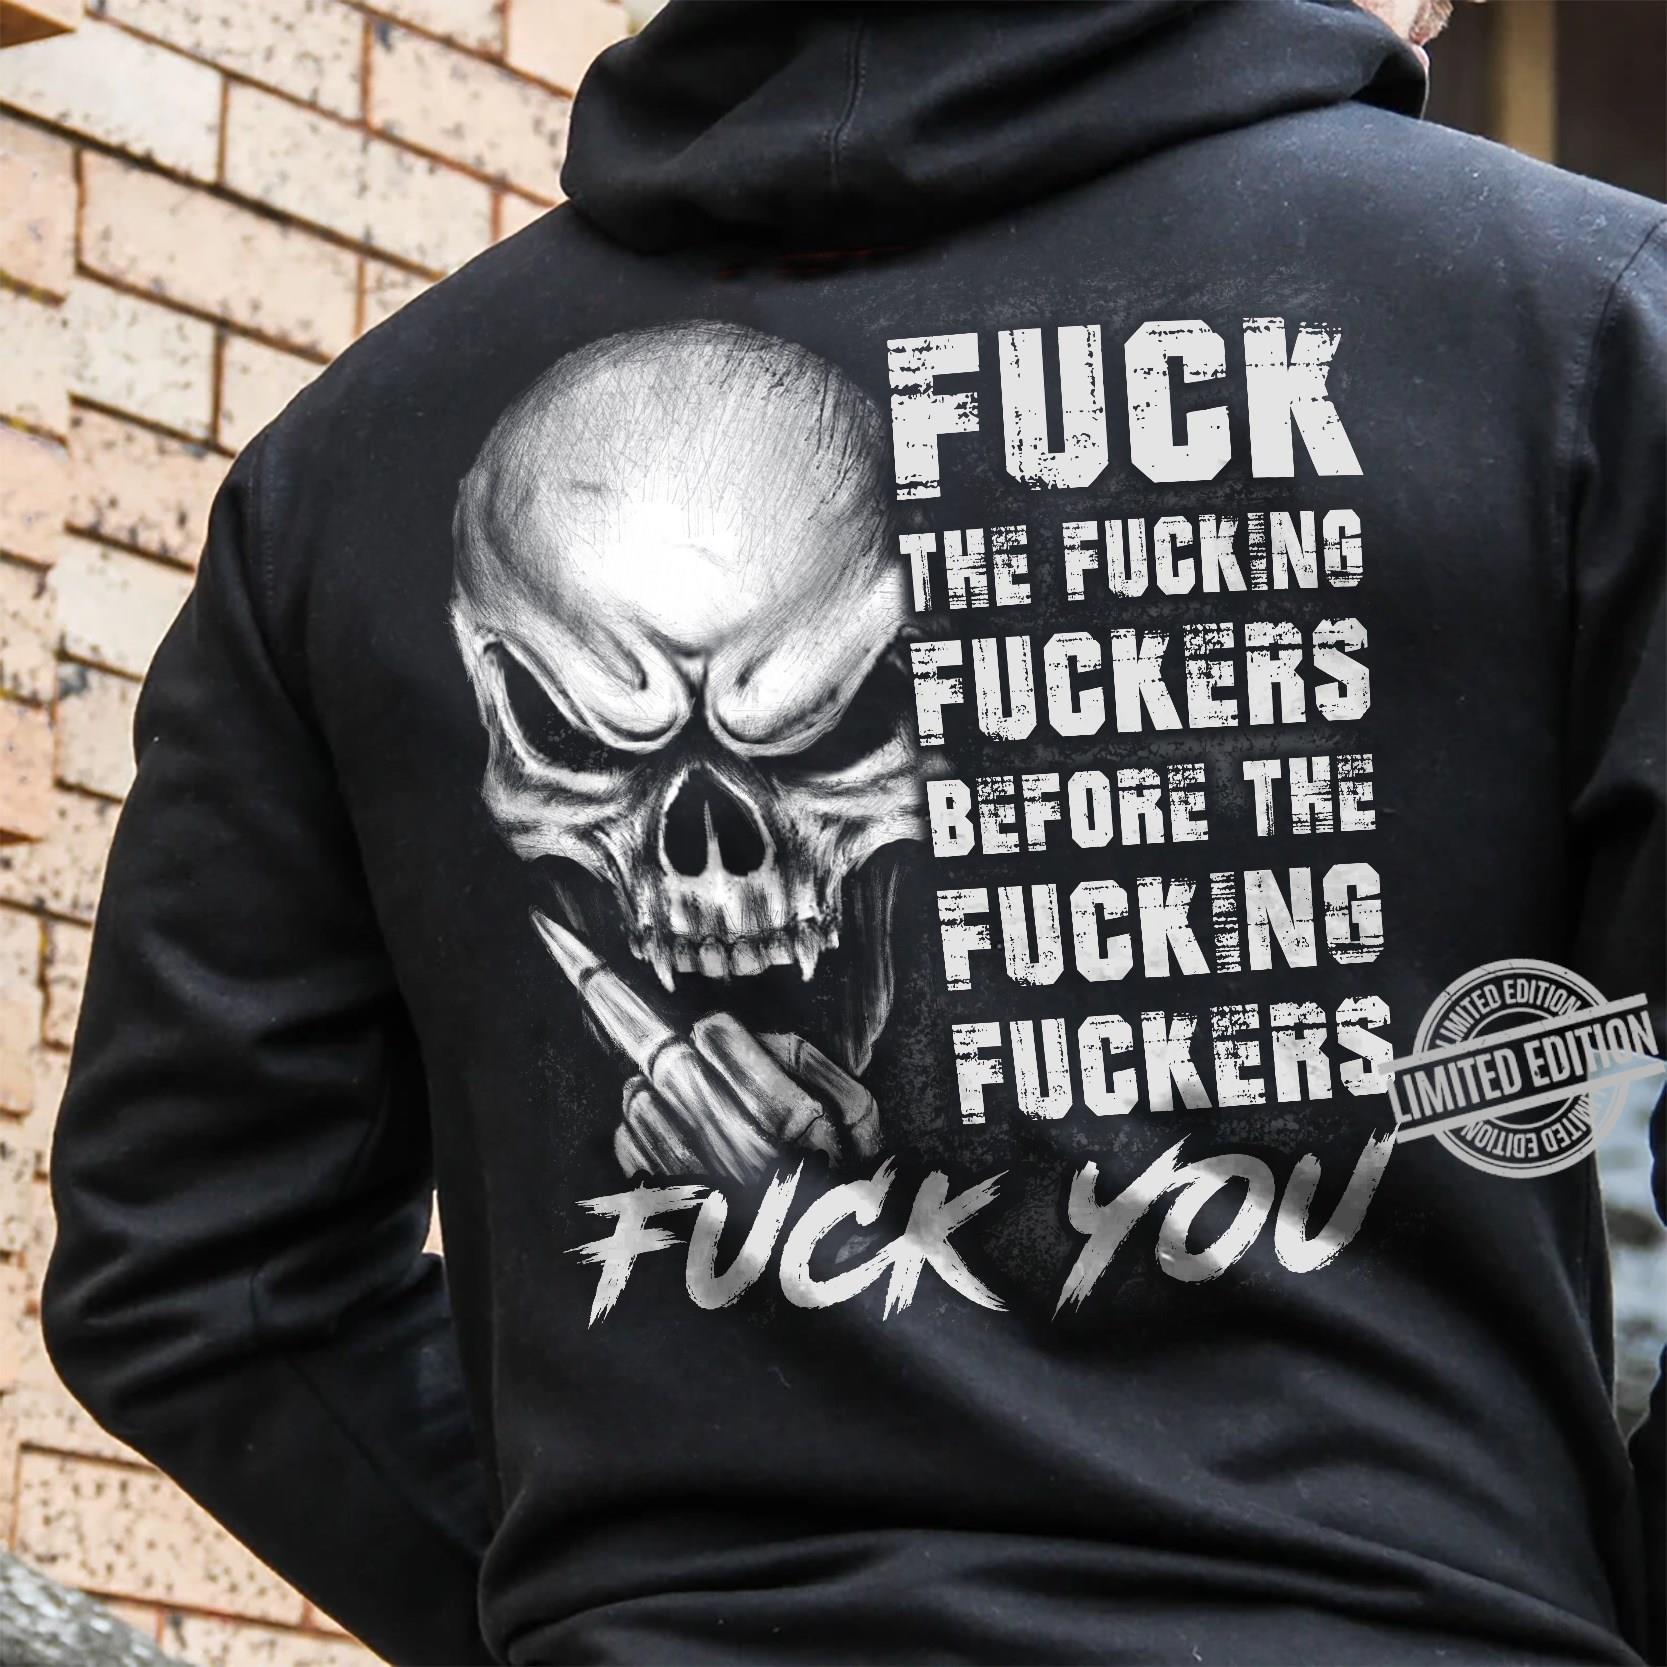 The Fuck The Fucking Fuckers Before The Fucking Fuckers Fuck You Shirt